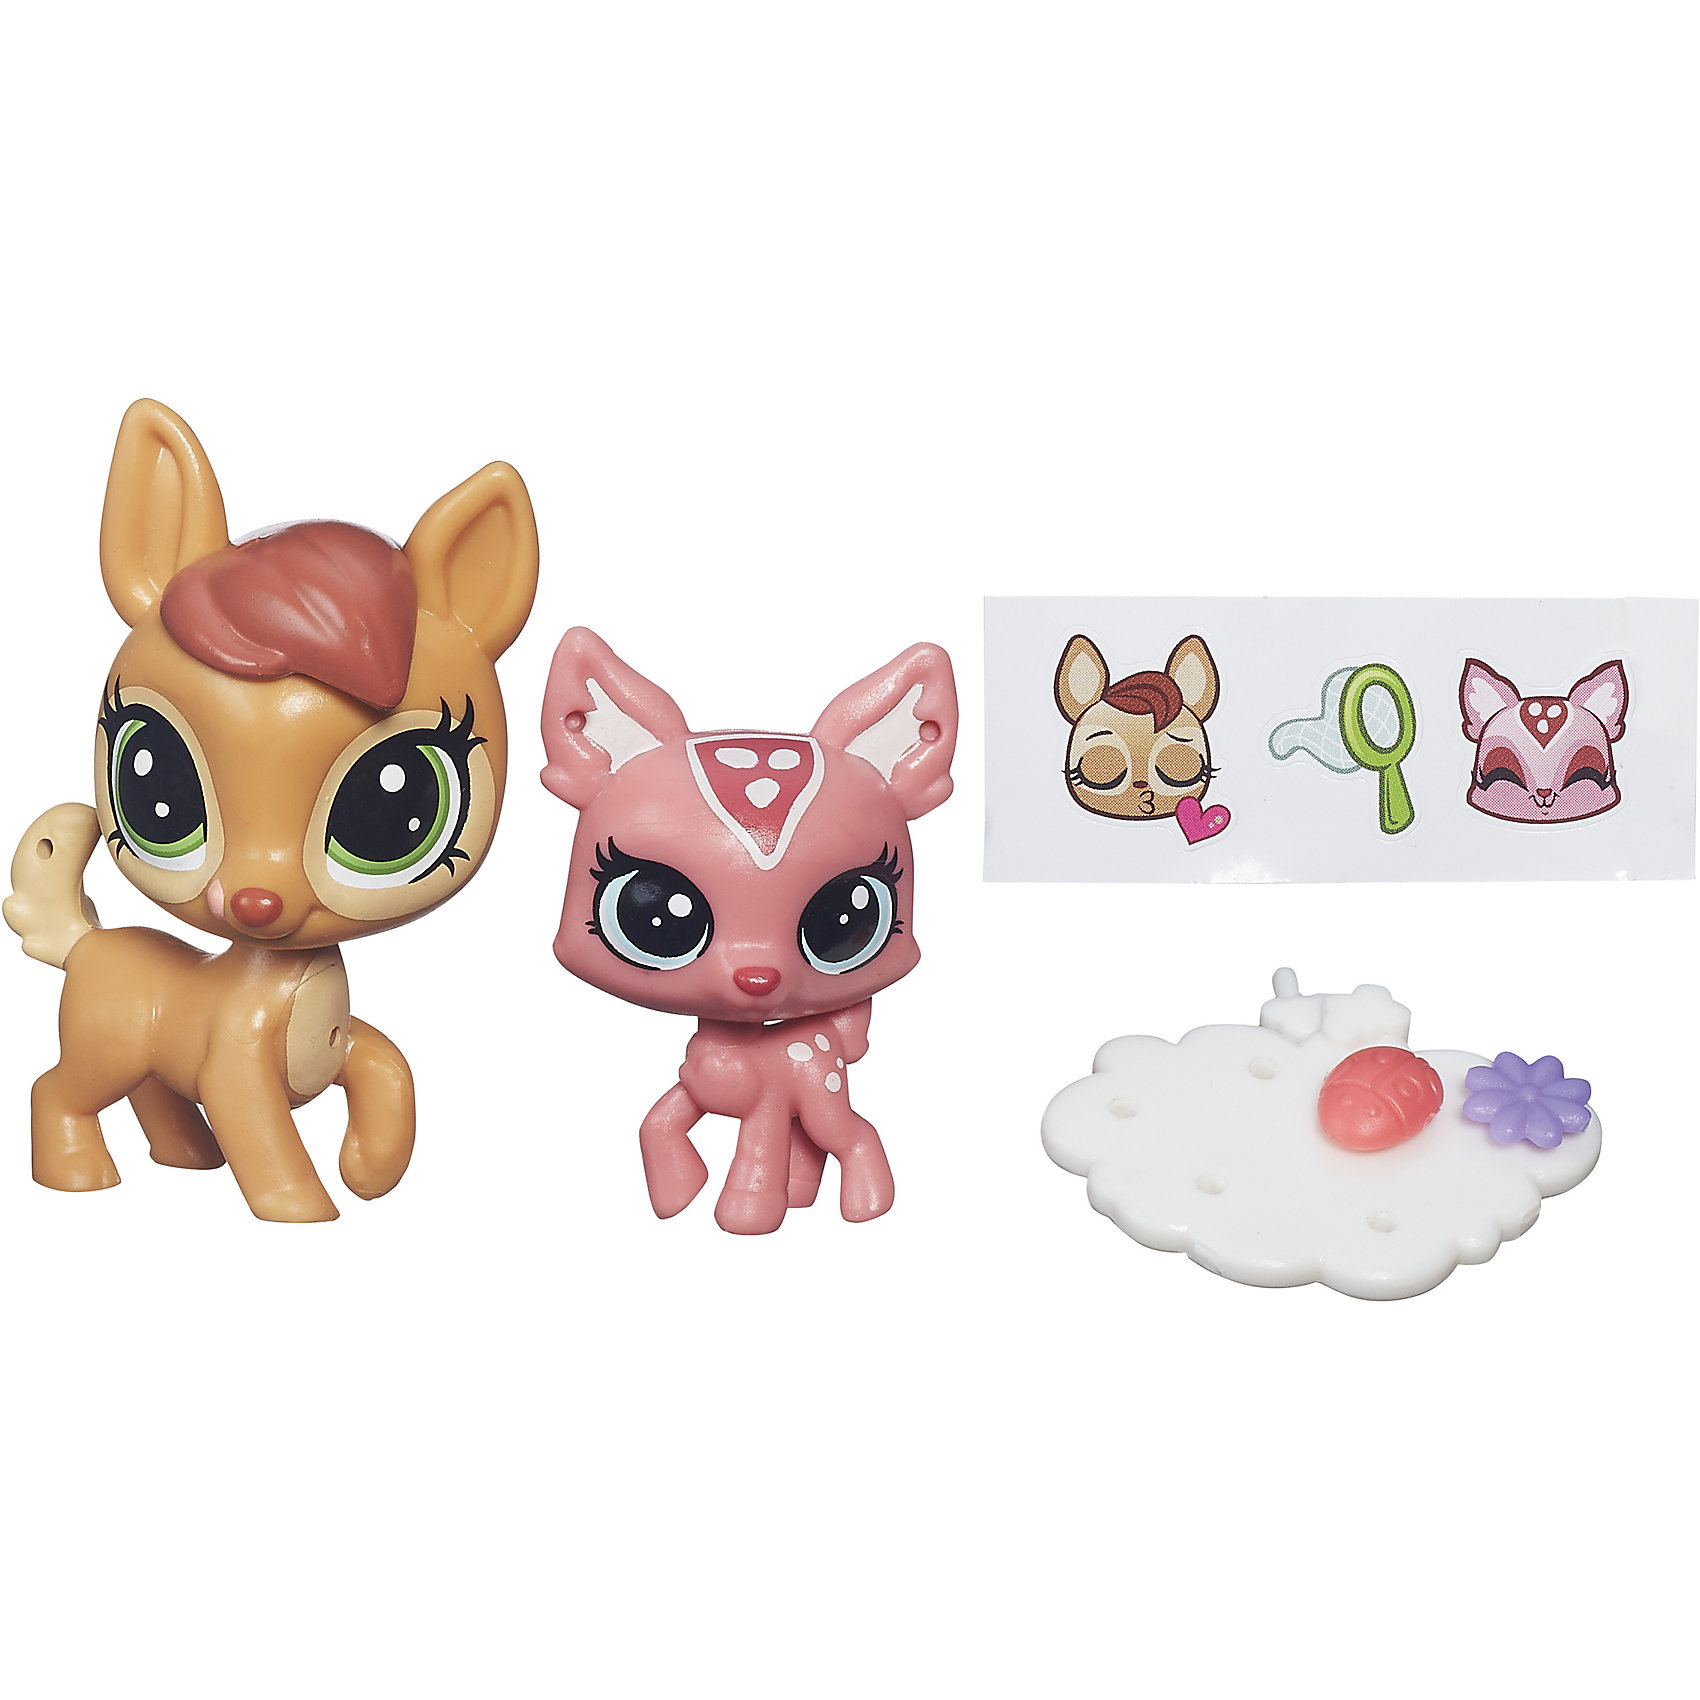 Hasbro Зверюшка и ее малыш, Littlest Pet Shop, А7313/B4762 фигурка littlest pet shop зверюшка в закрытой упаковке 5 см в ассортименте